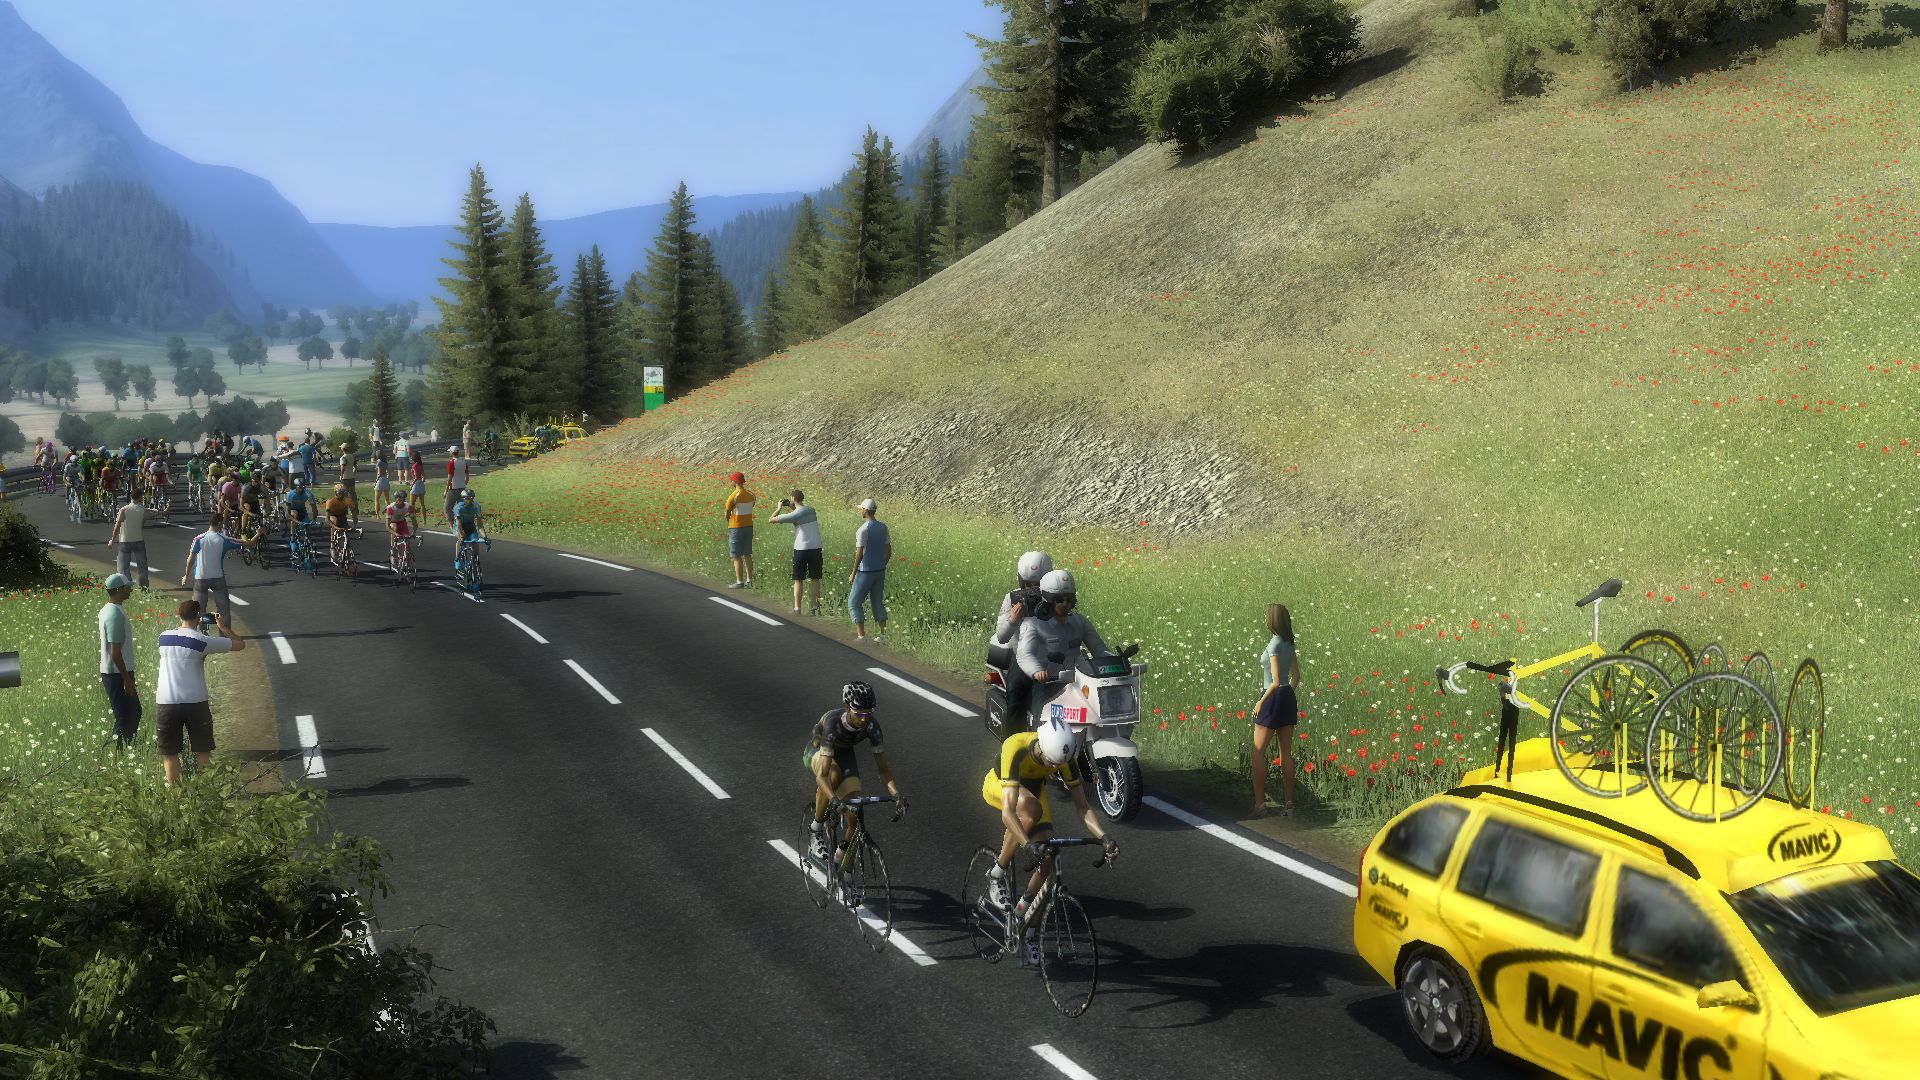 pcmdaily.com/images/mg/2017/Races/U23/Avenir/AVES7%2013.jpg